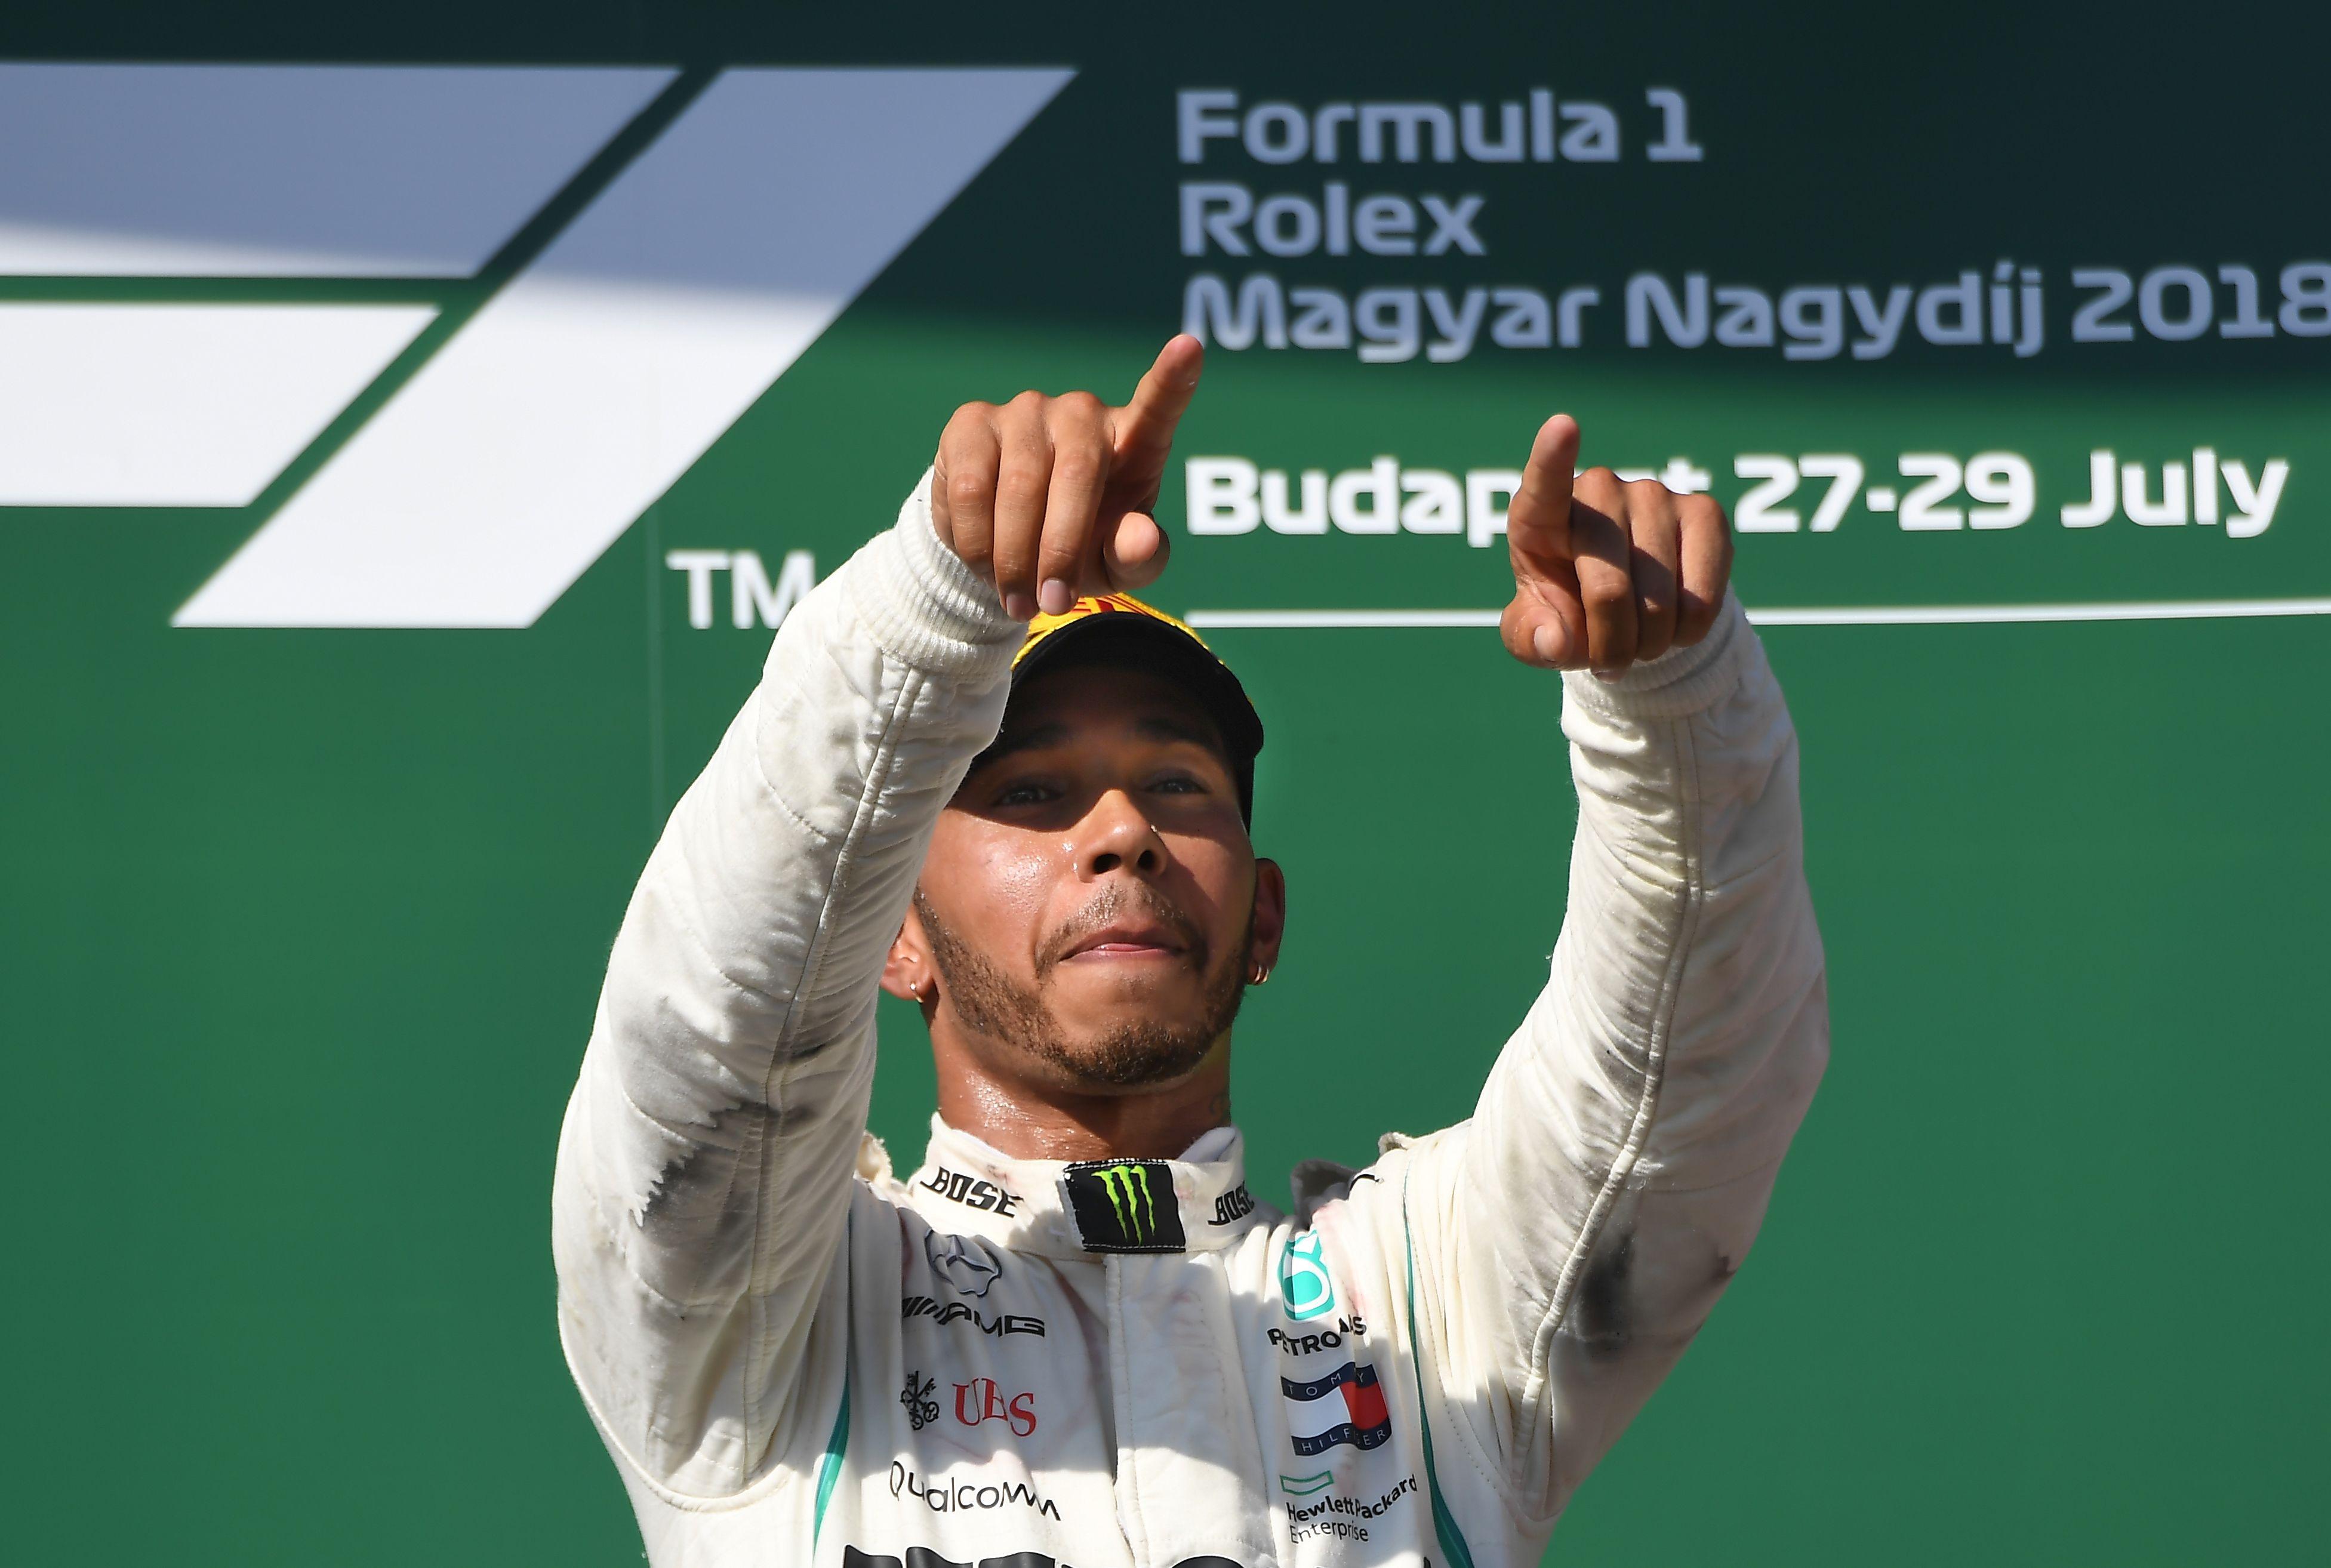 Hamilton now has a 24-point lead over Ferrari's Sebastian Vettel in the title race